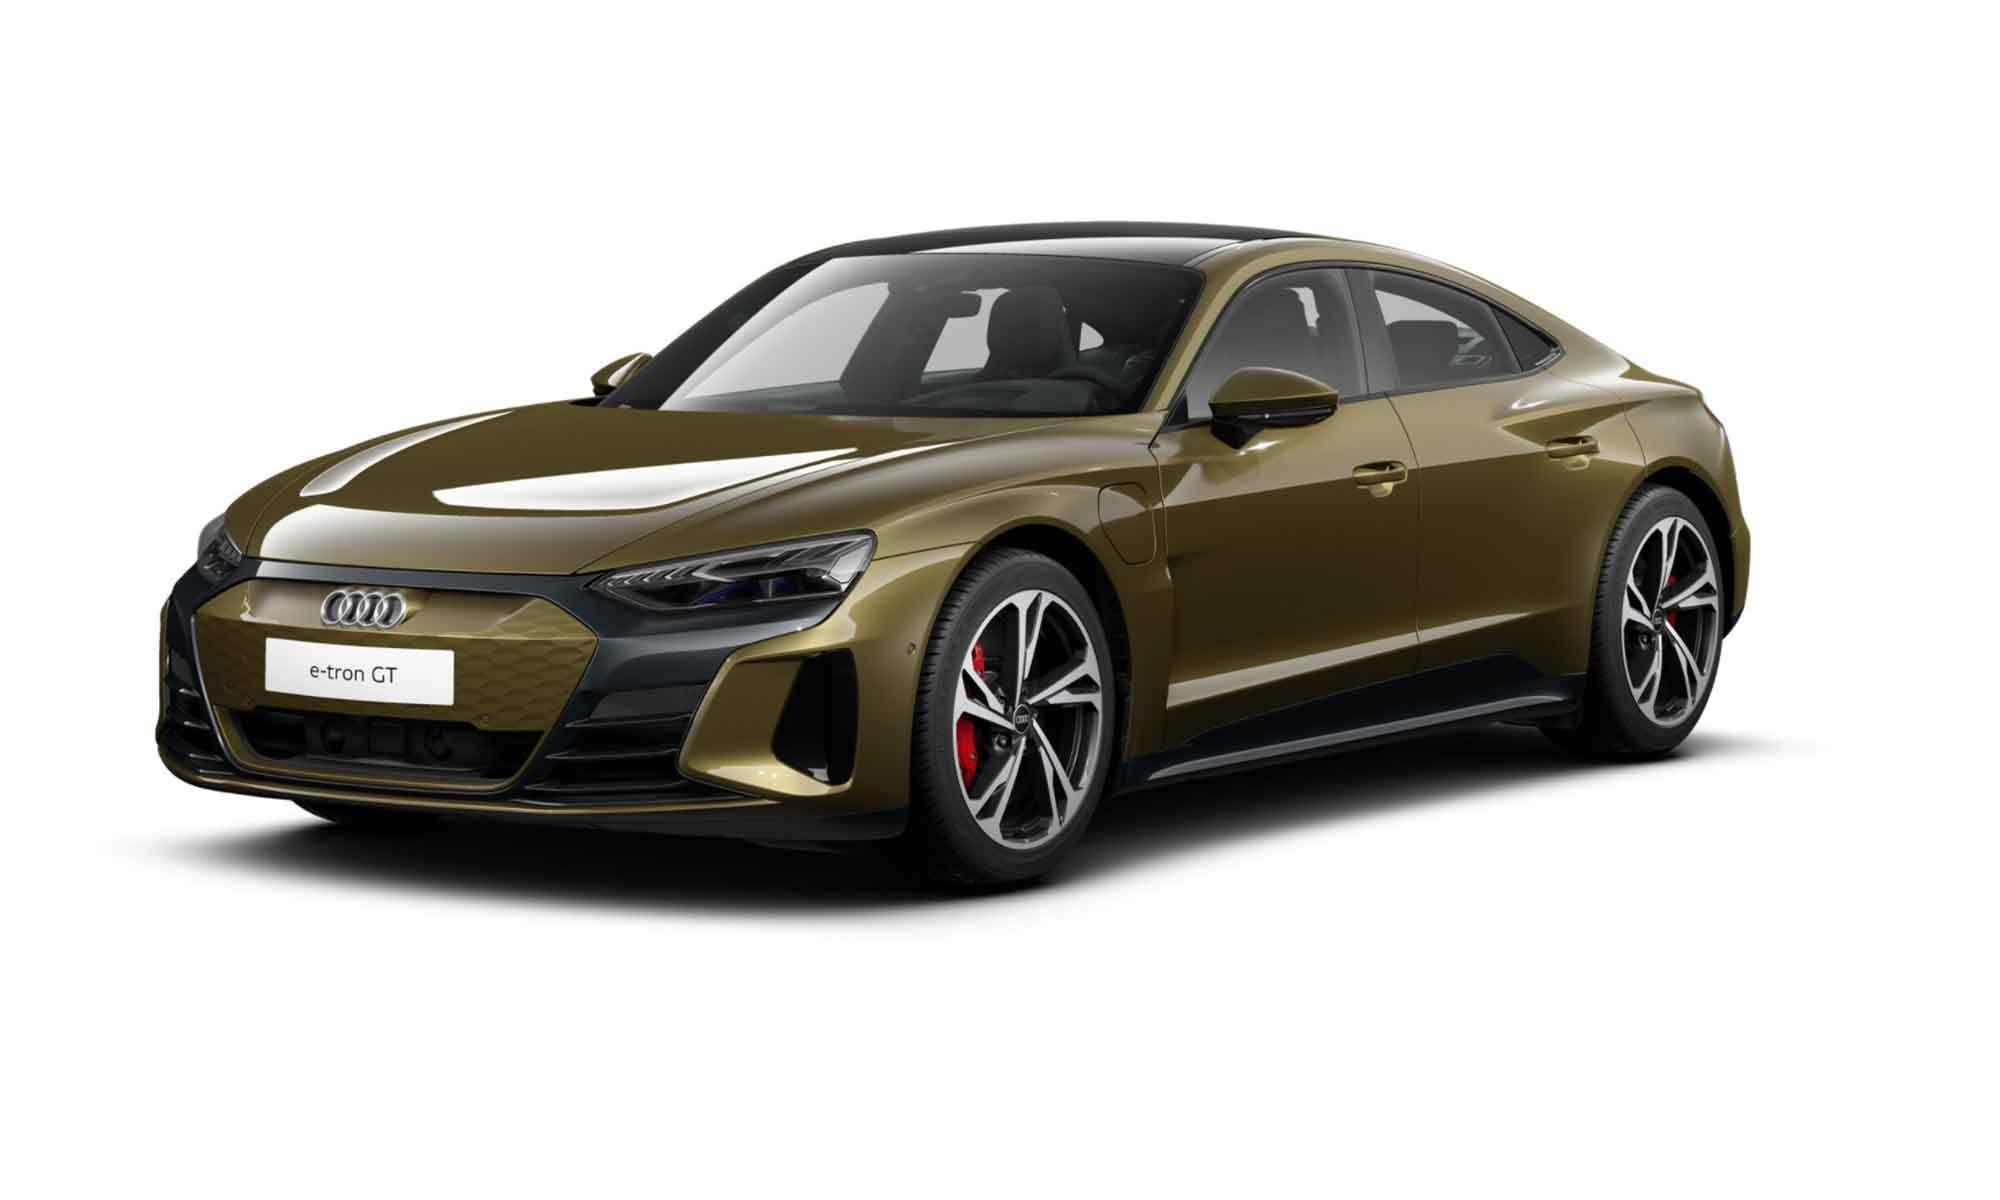 Audi Etron Gt White Background